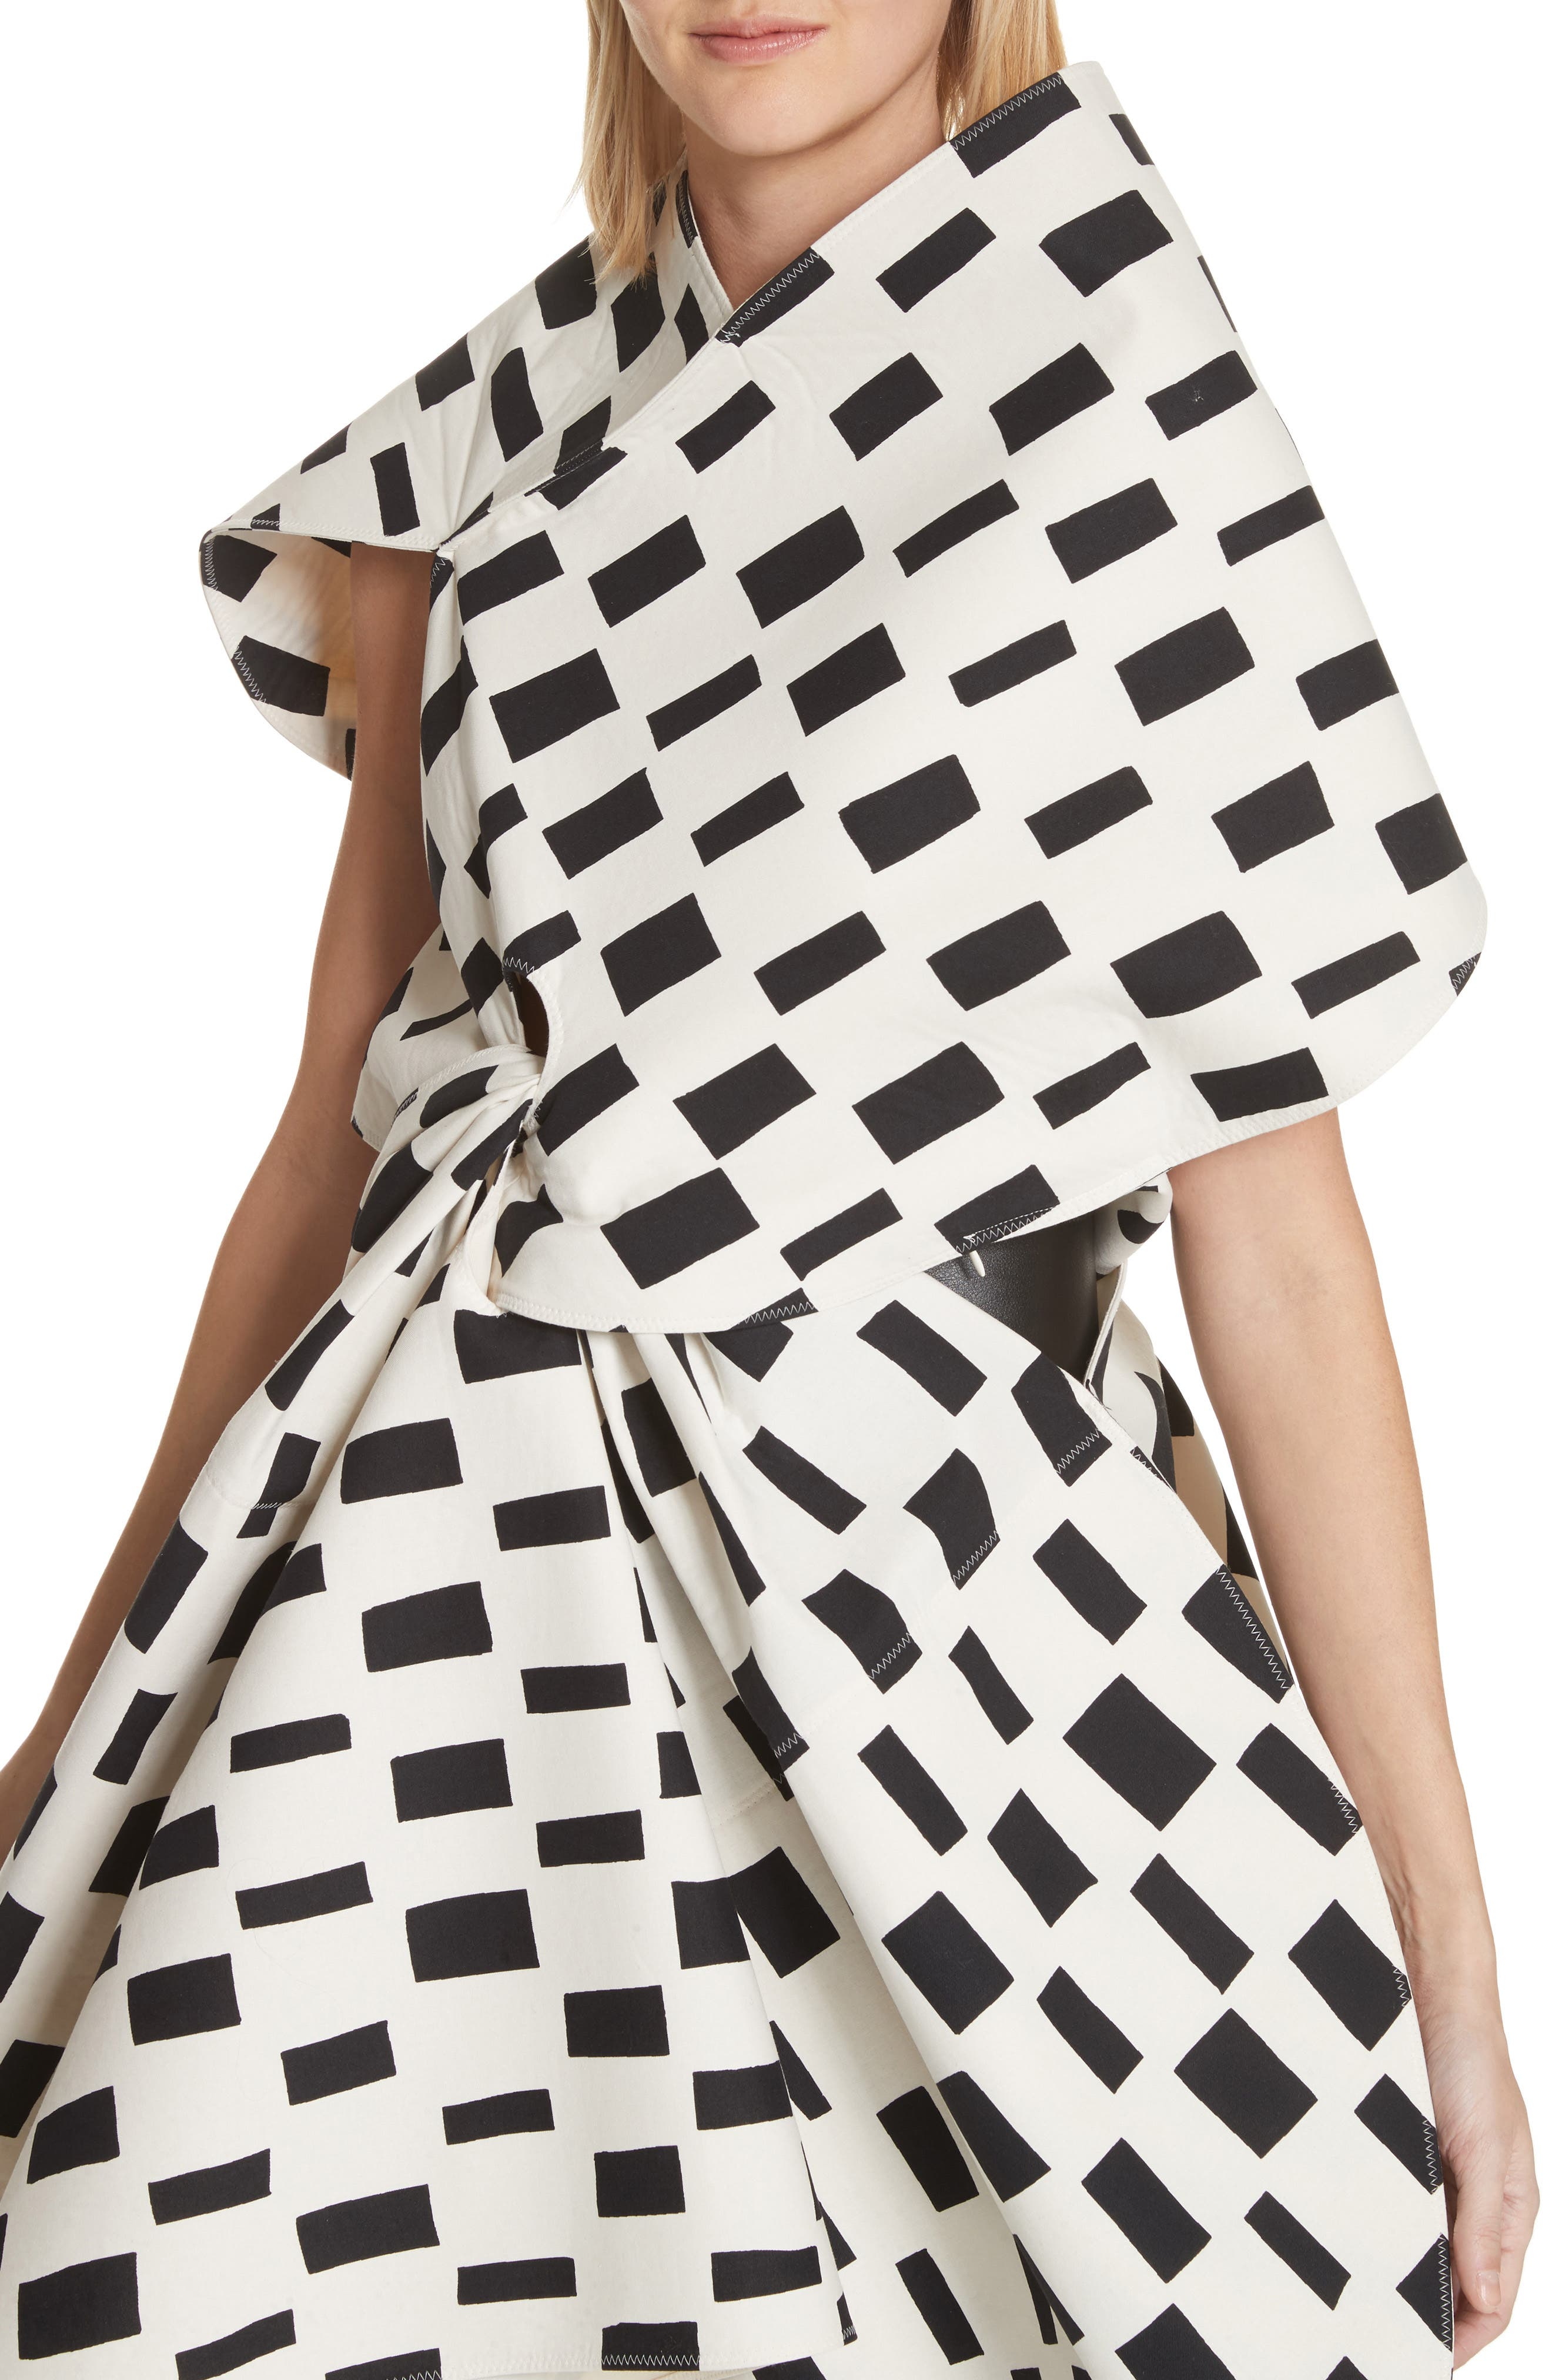 Interweave Geo Print Dress,                             Alternate thumbnail 4, color,                             Off White/ Black